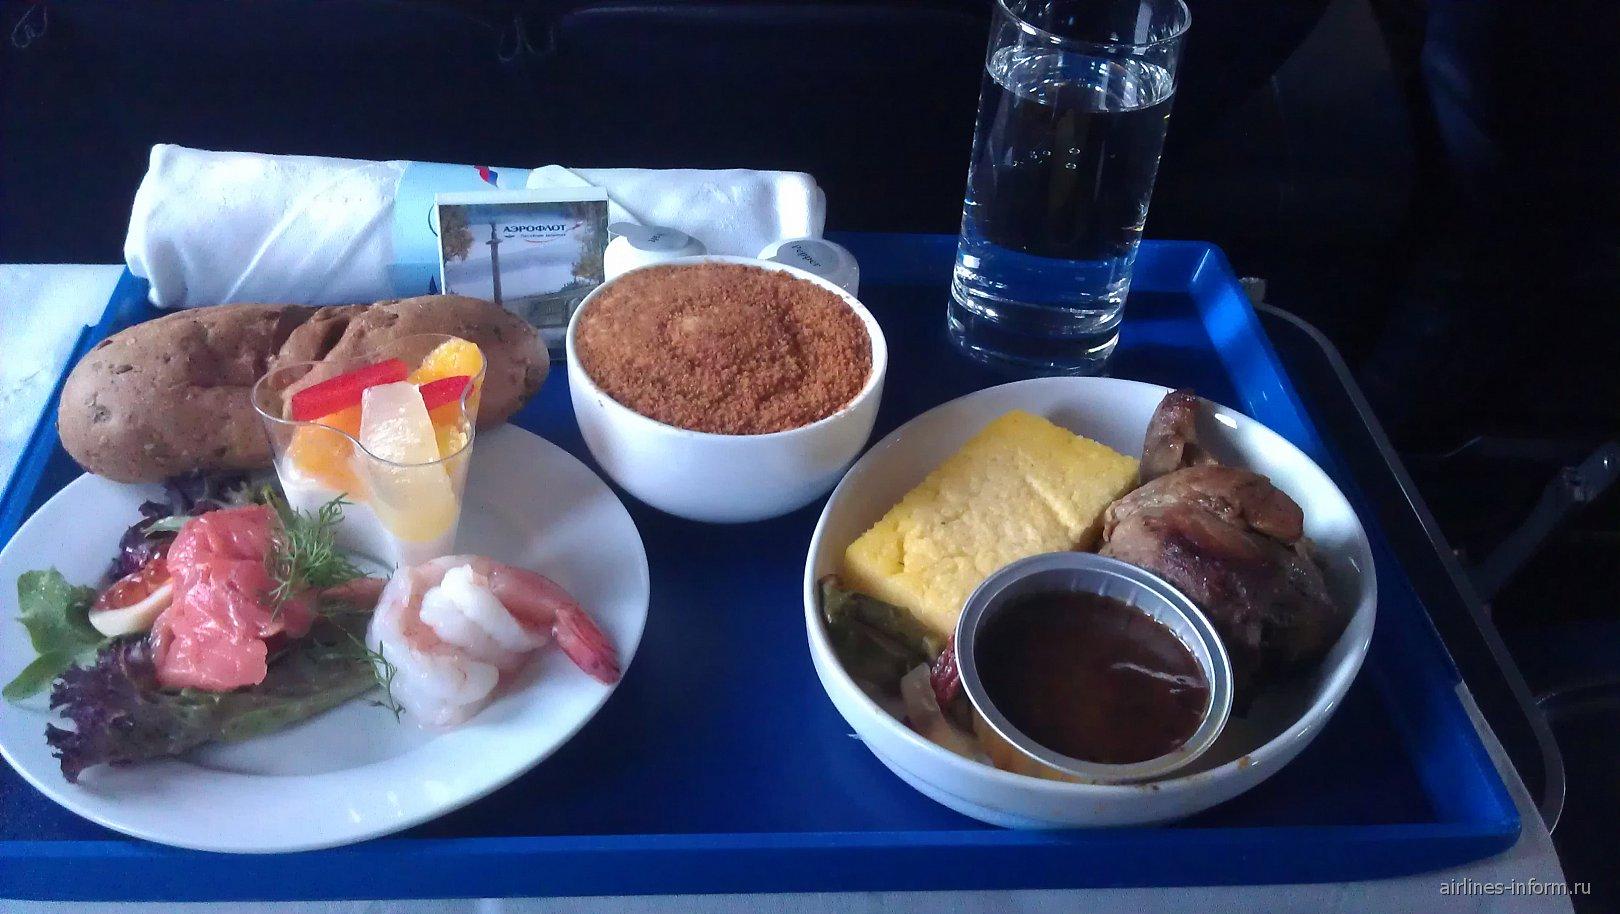 Завтрак в бизнес-классе Аэрофлота на рейсе Санкт-Петербург-Москва